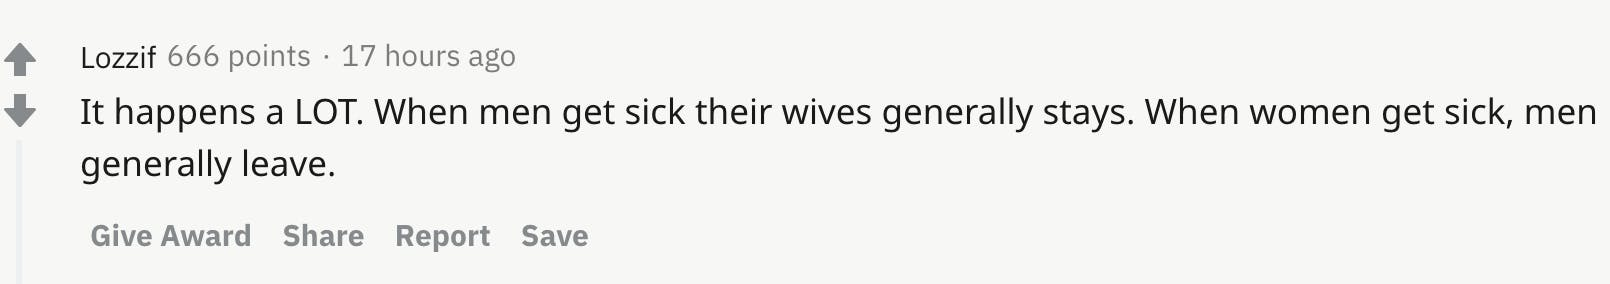 It happens a LOT. When men get sick their wives generally stays. When women get sick, men generally leave.